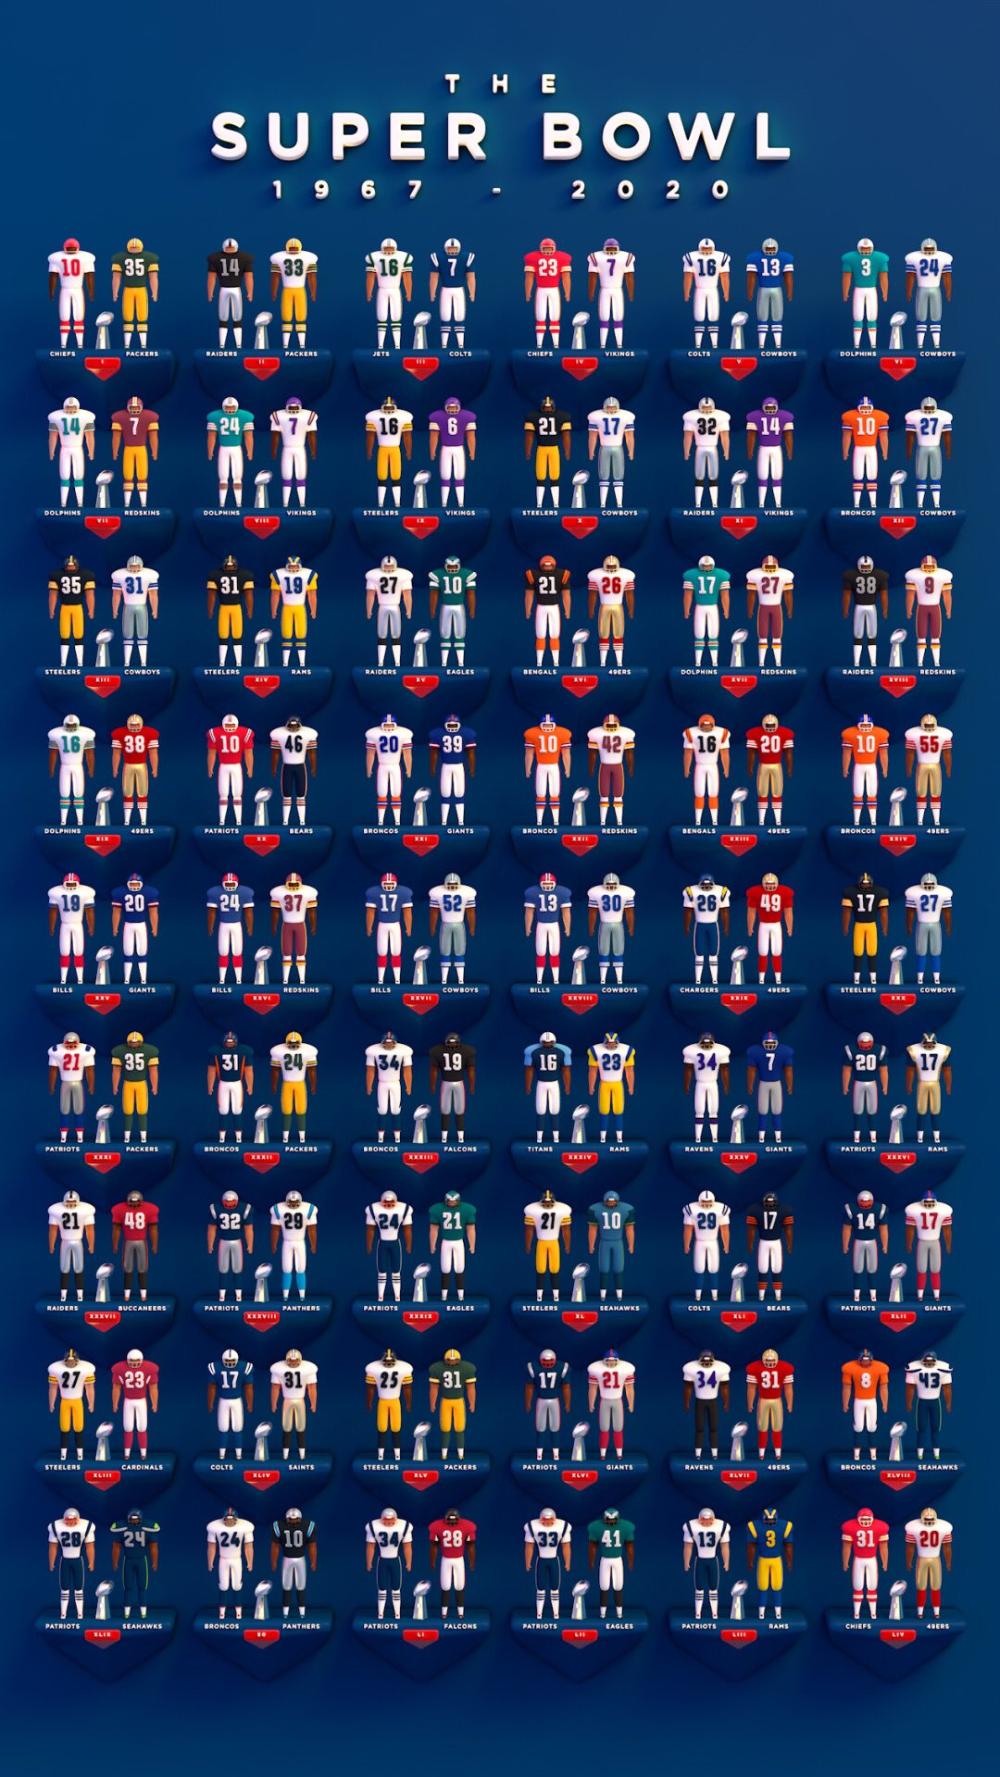 Fraser Davidson On Twitter In 2020 Nfl Football 49ers Super Bowl Nfl Football Helmets